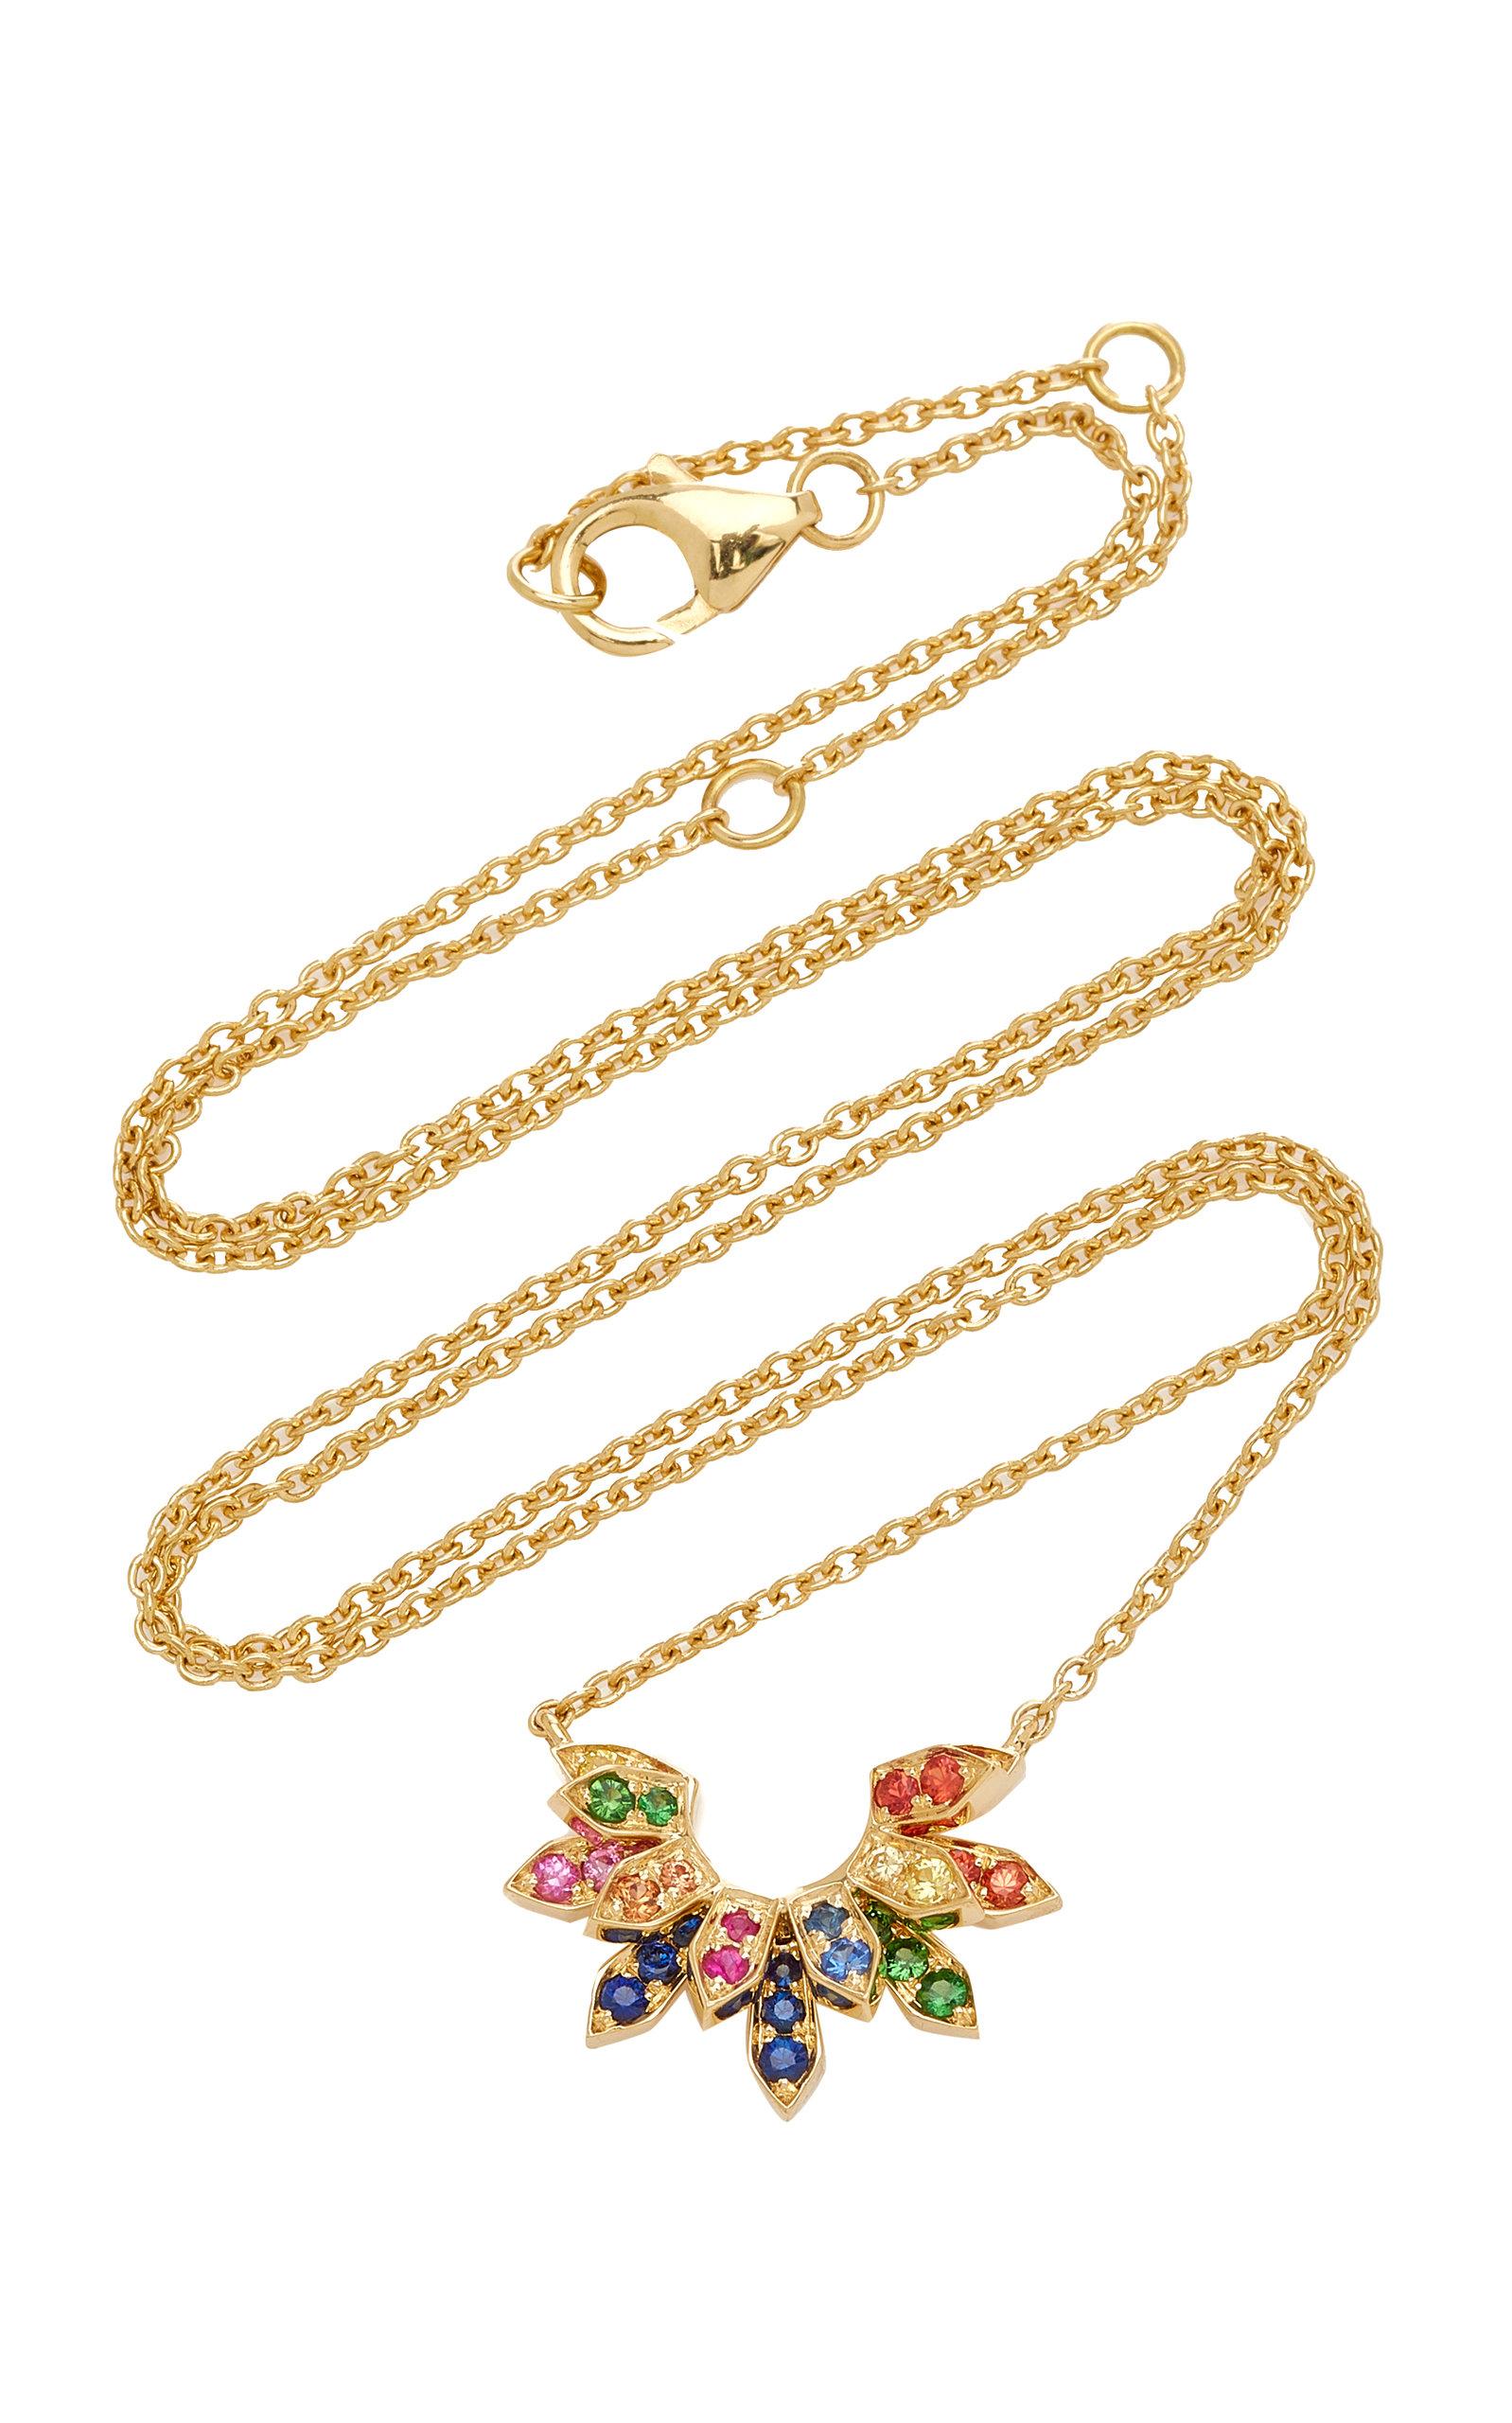 Women's Mini Penacho 18K Yellow Gold Sapphire Necklace